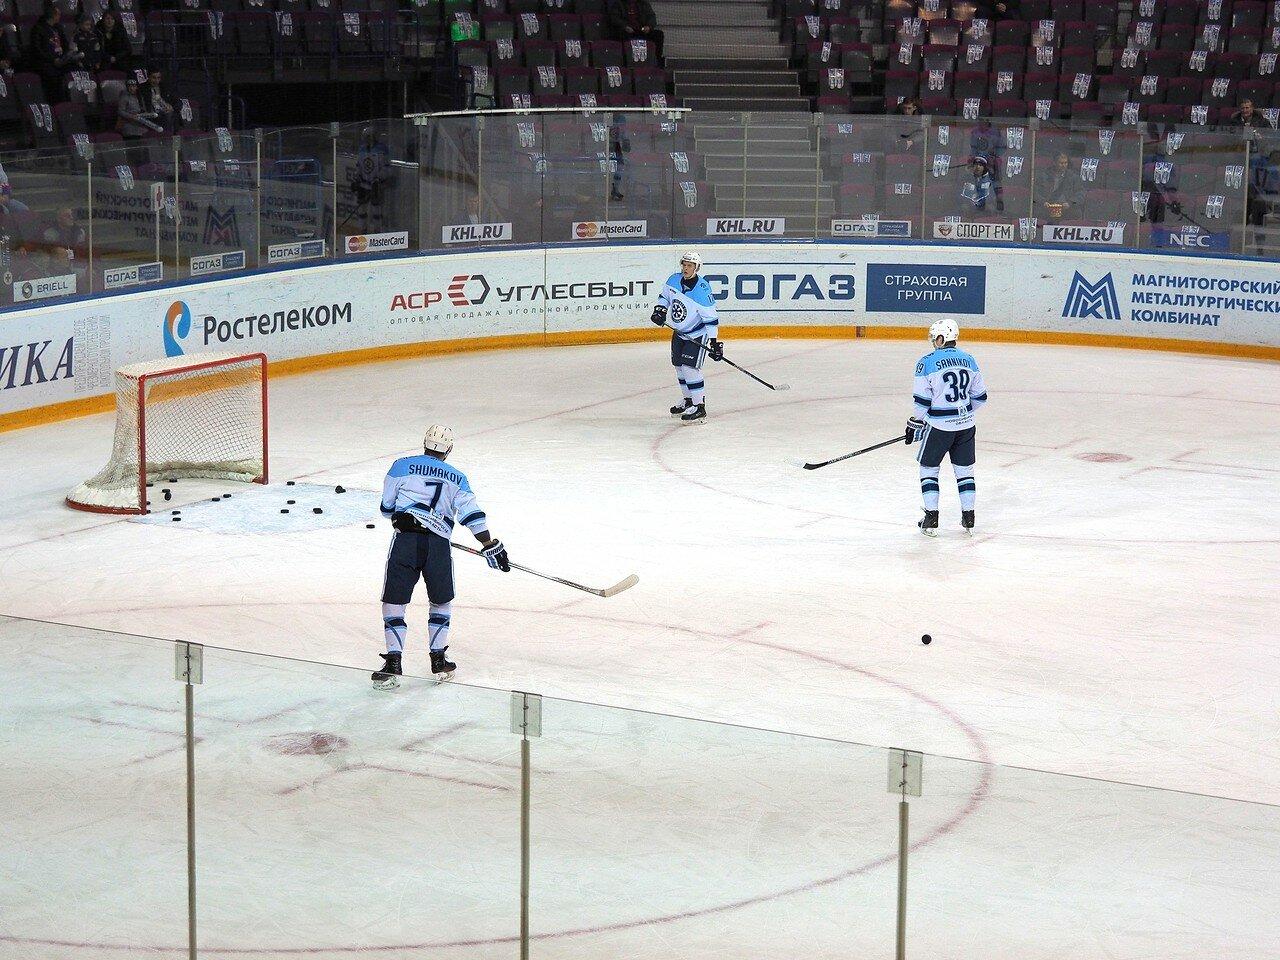 49Плей-офф 2016 Восток 1/2 Металлург - Сибирь 10.03.2016